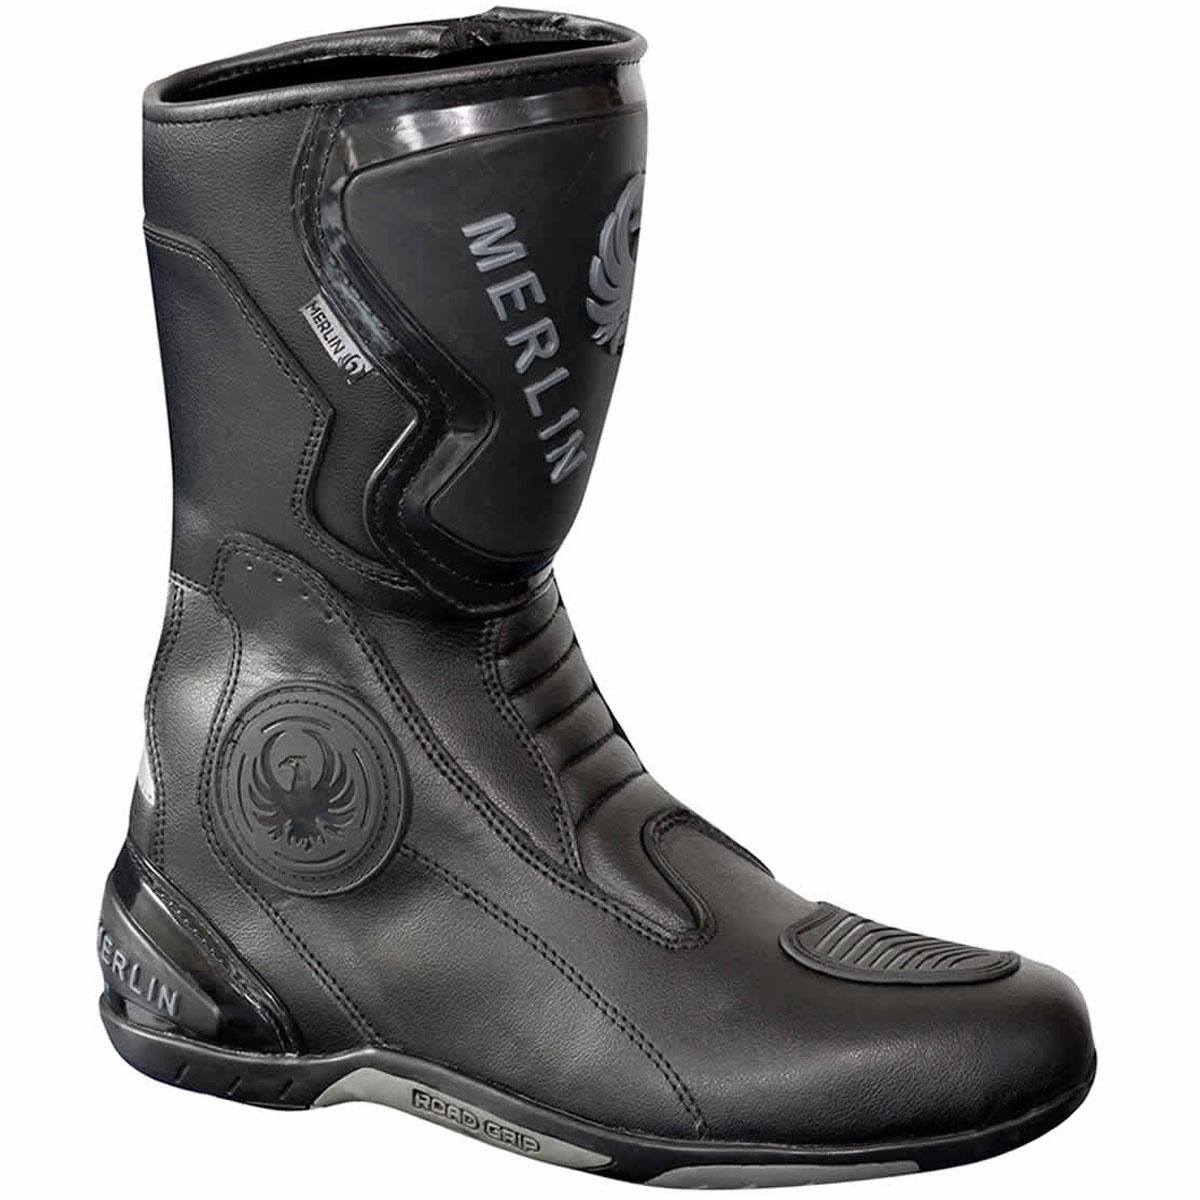 Merlin Aragon boots